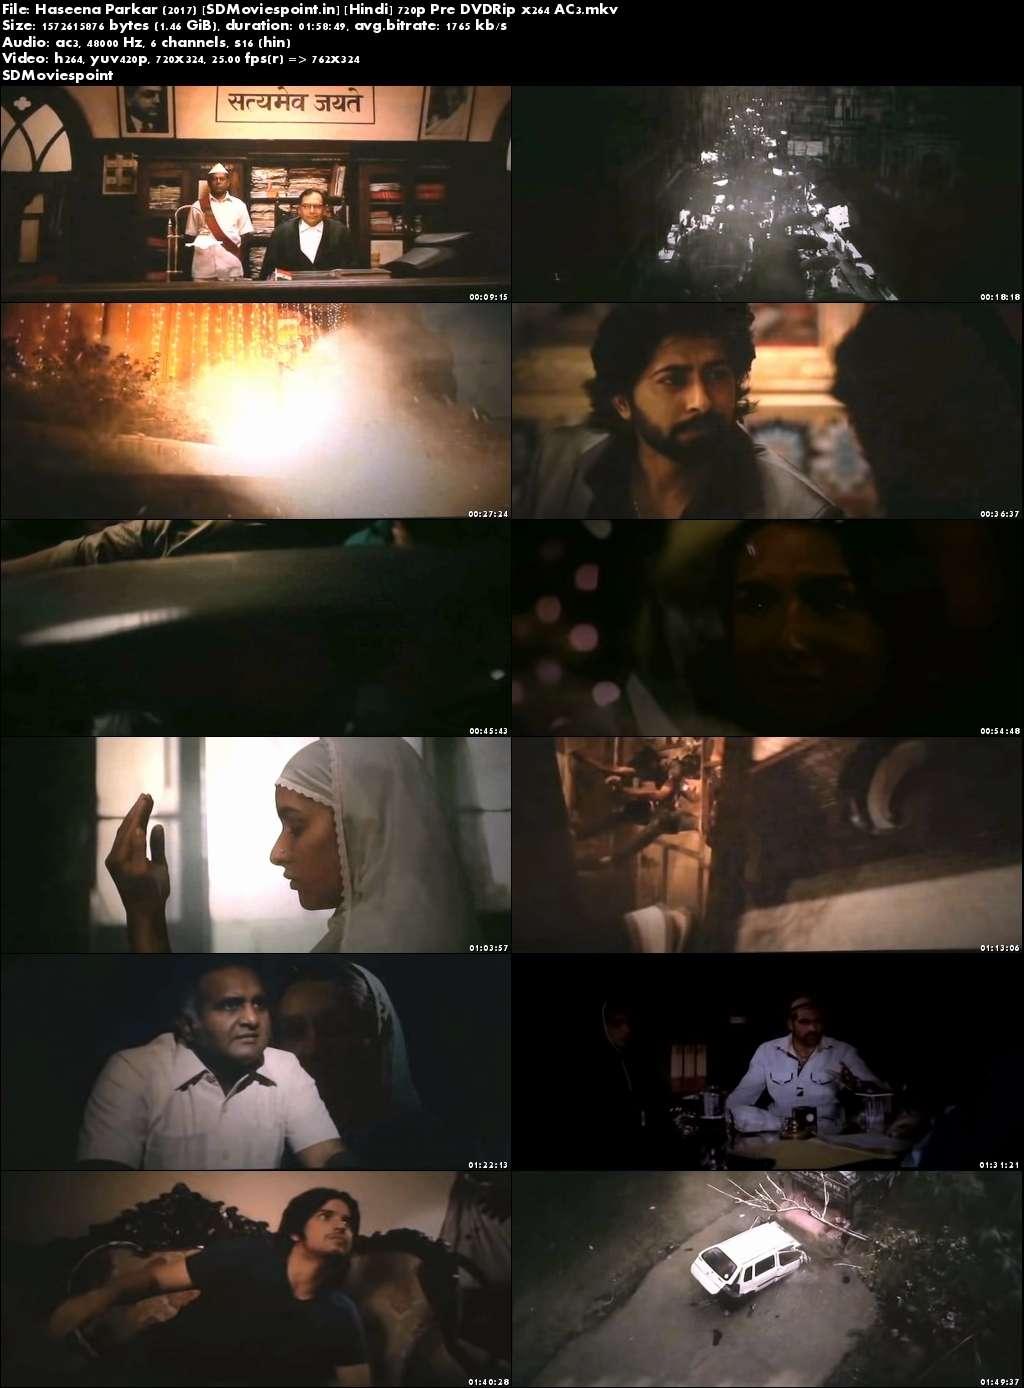 Screen Shots Haseena parkar 2017 Full Movie Download Free 720p